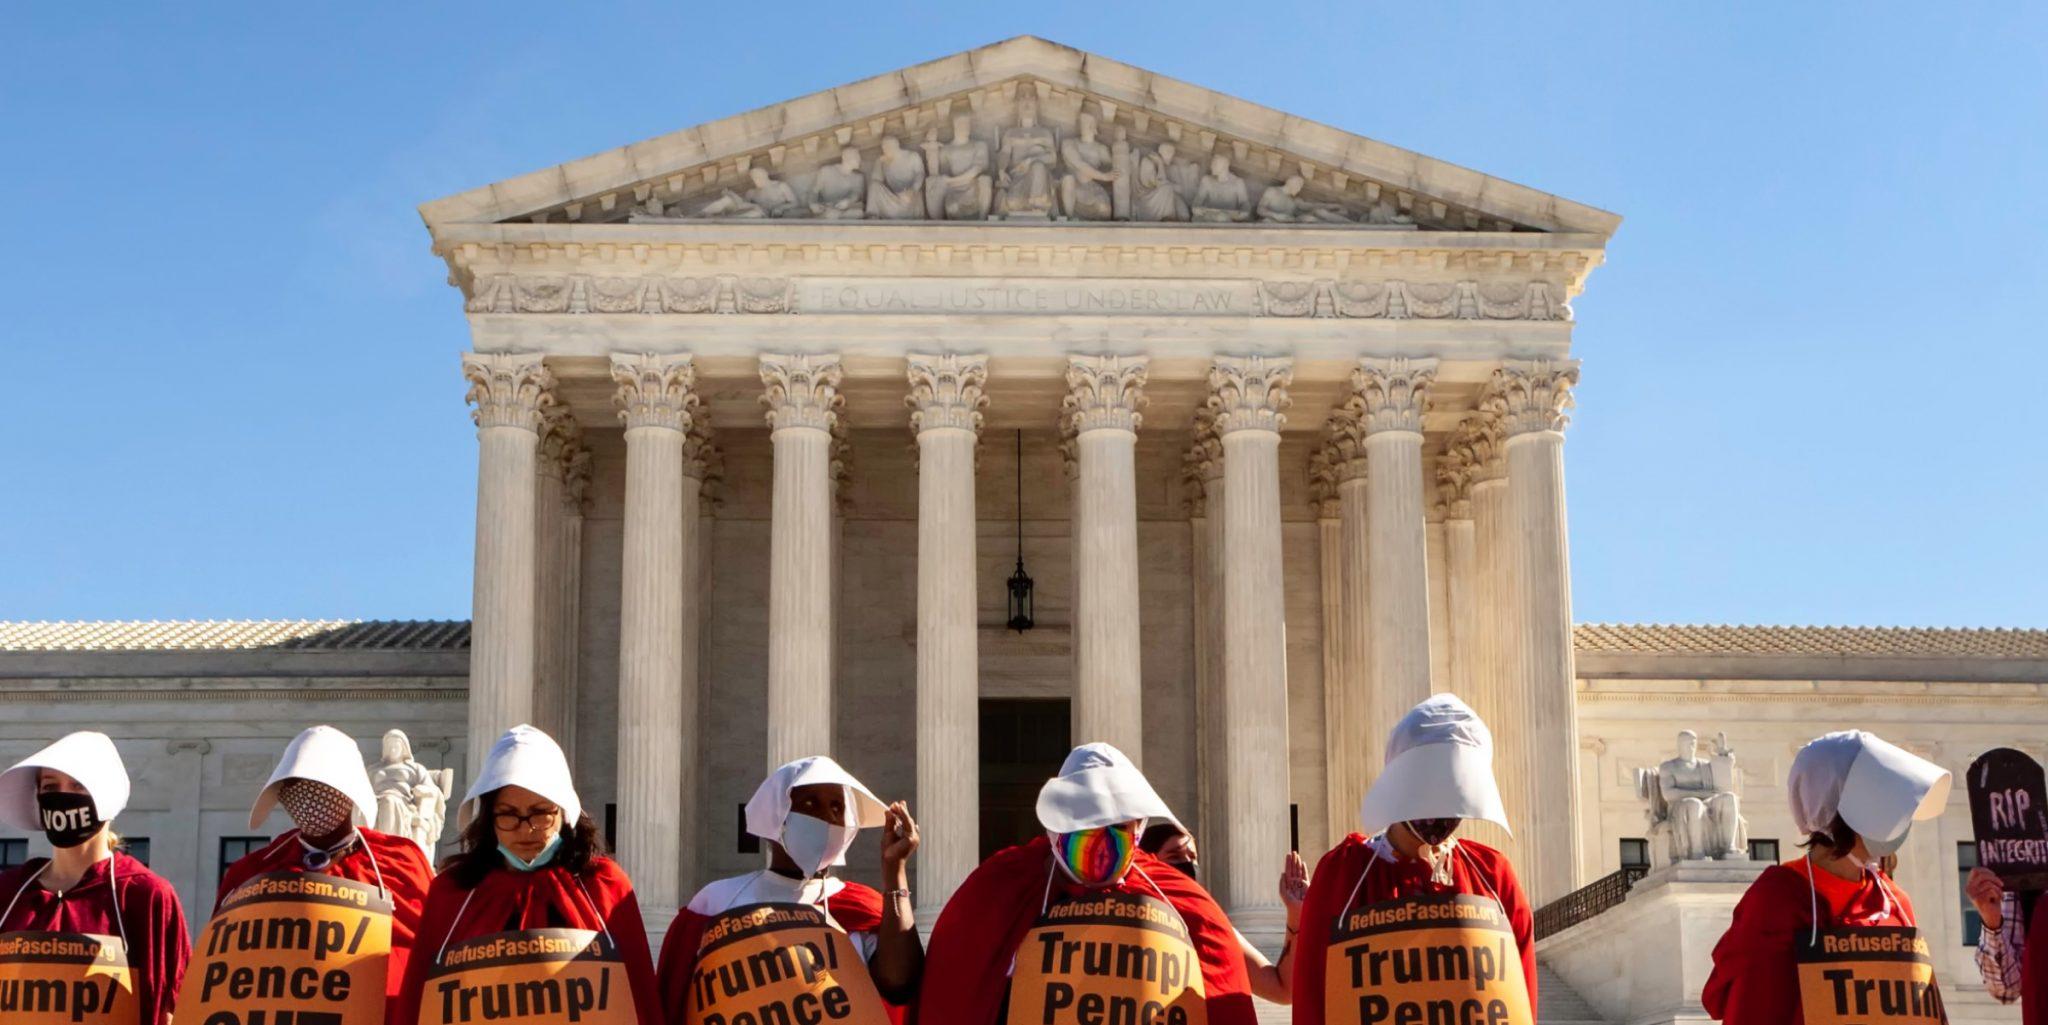 What Politicized the Supreme Court?